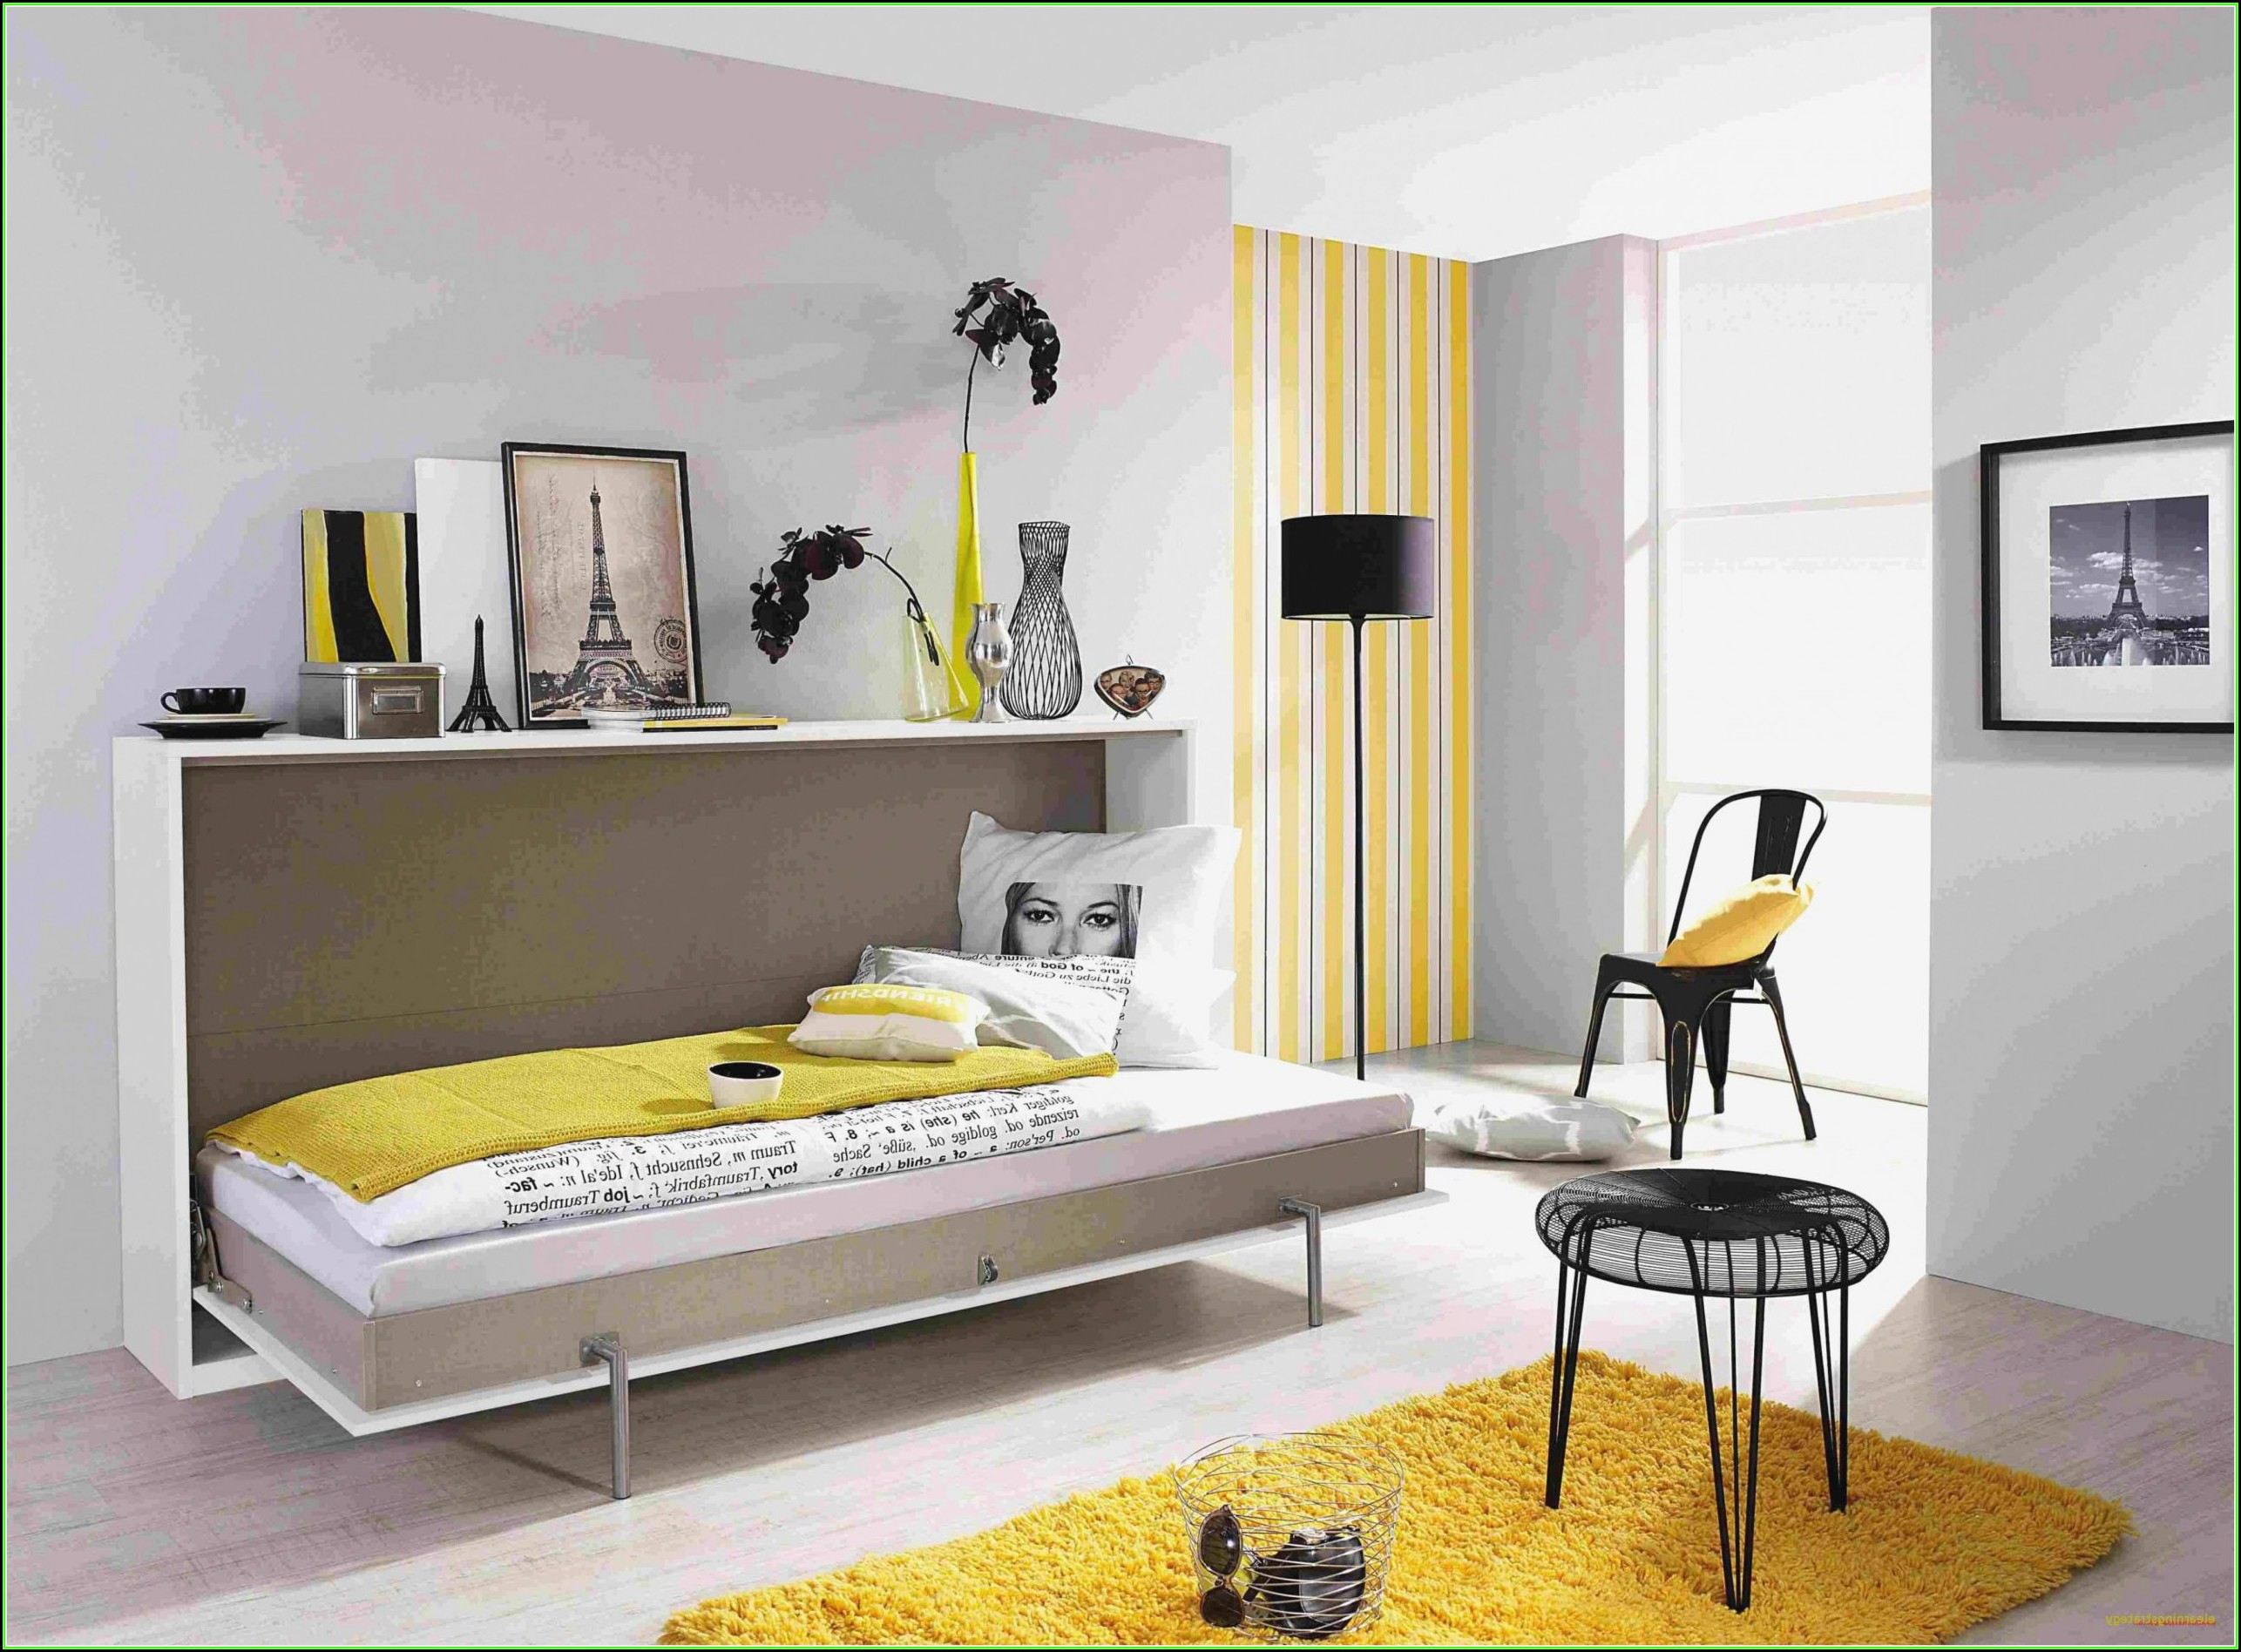 Einrichtungsideen Kinderzimmer Mädchen Ikea